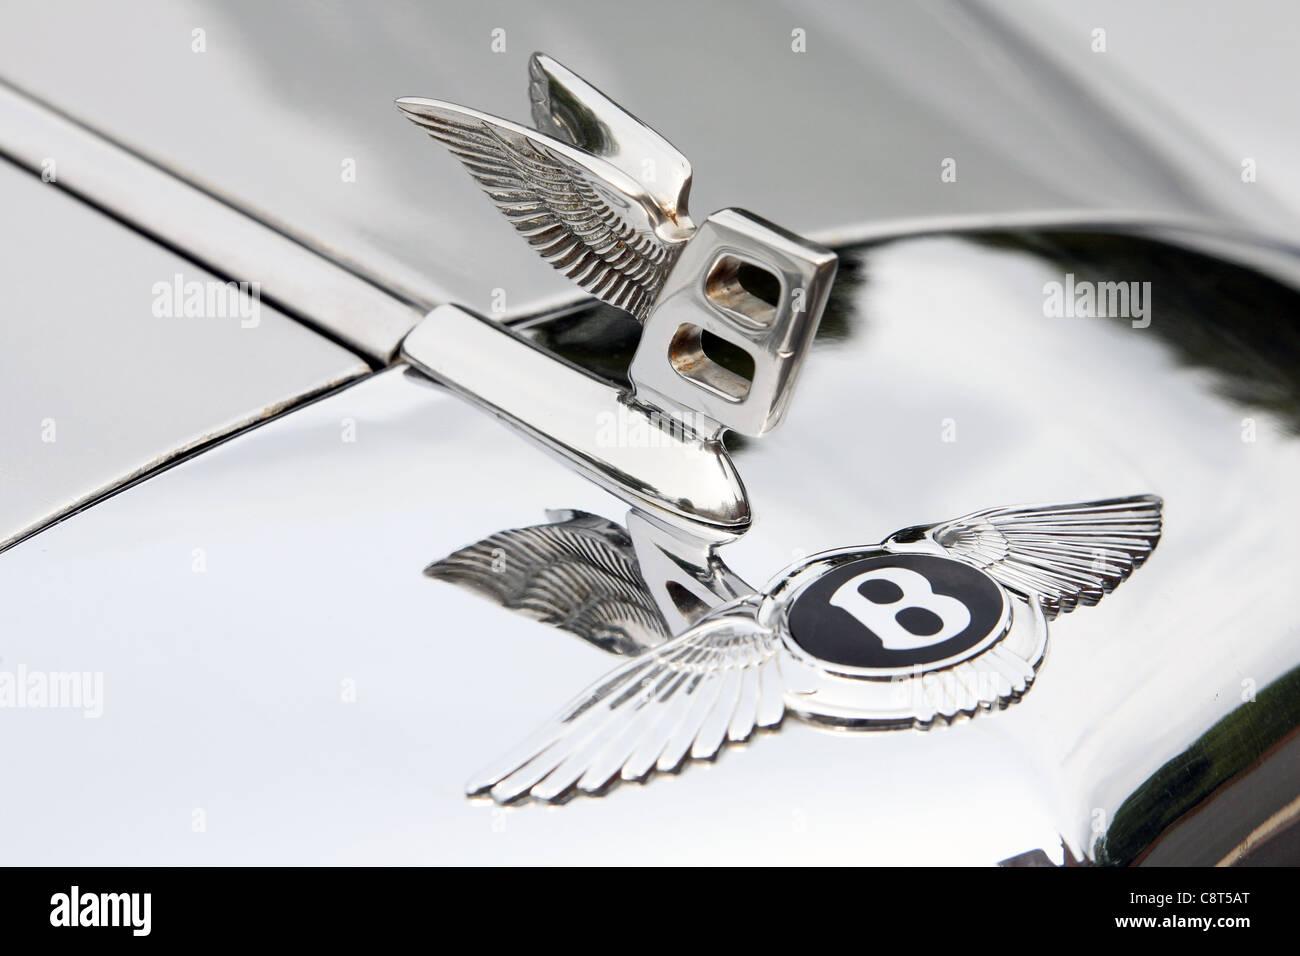 Logo On A Vintage Bentley Car Stock Photo Alamy